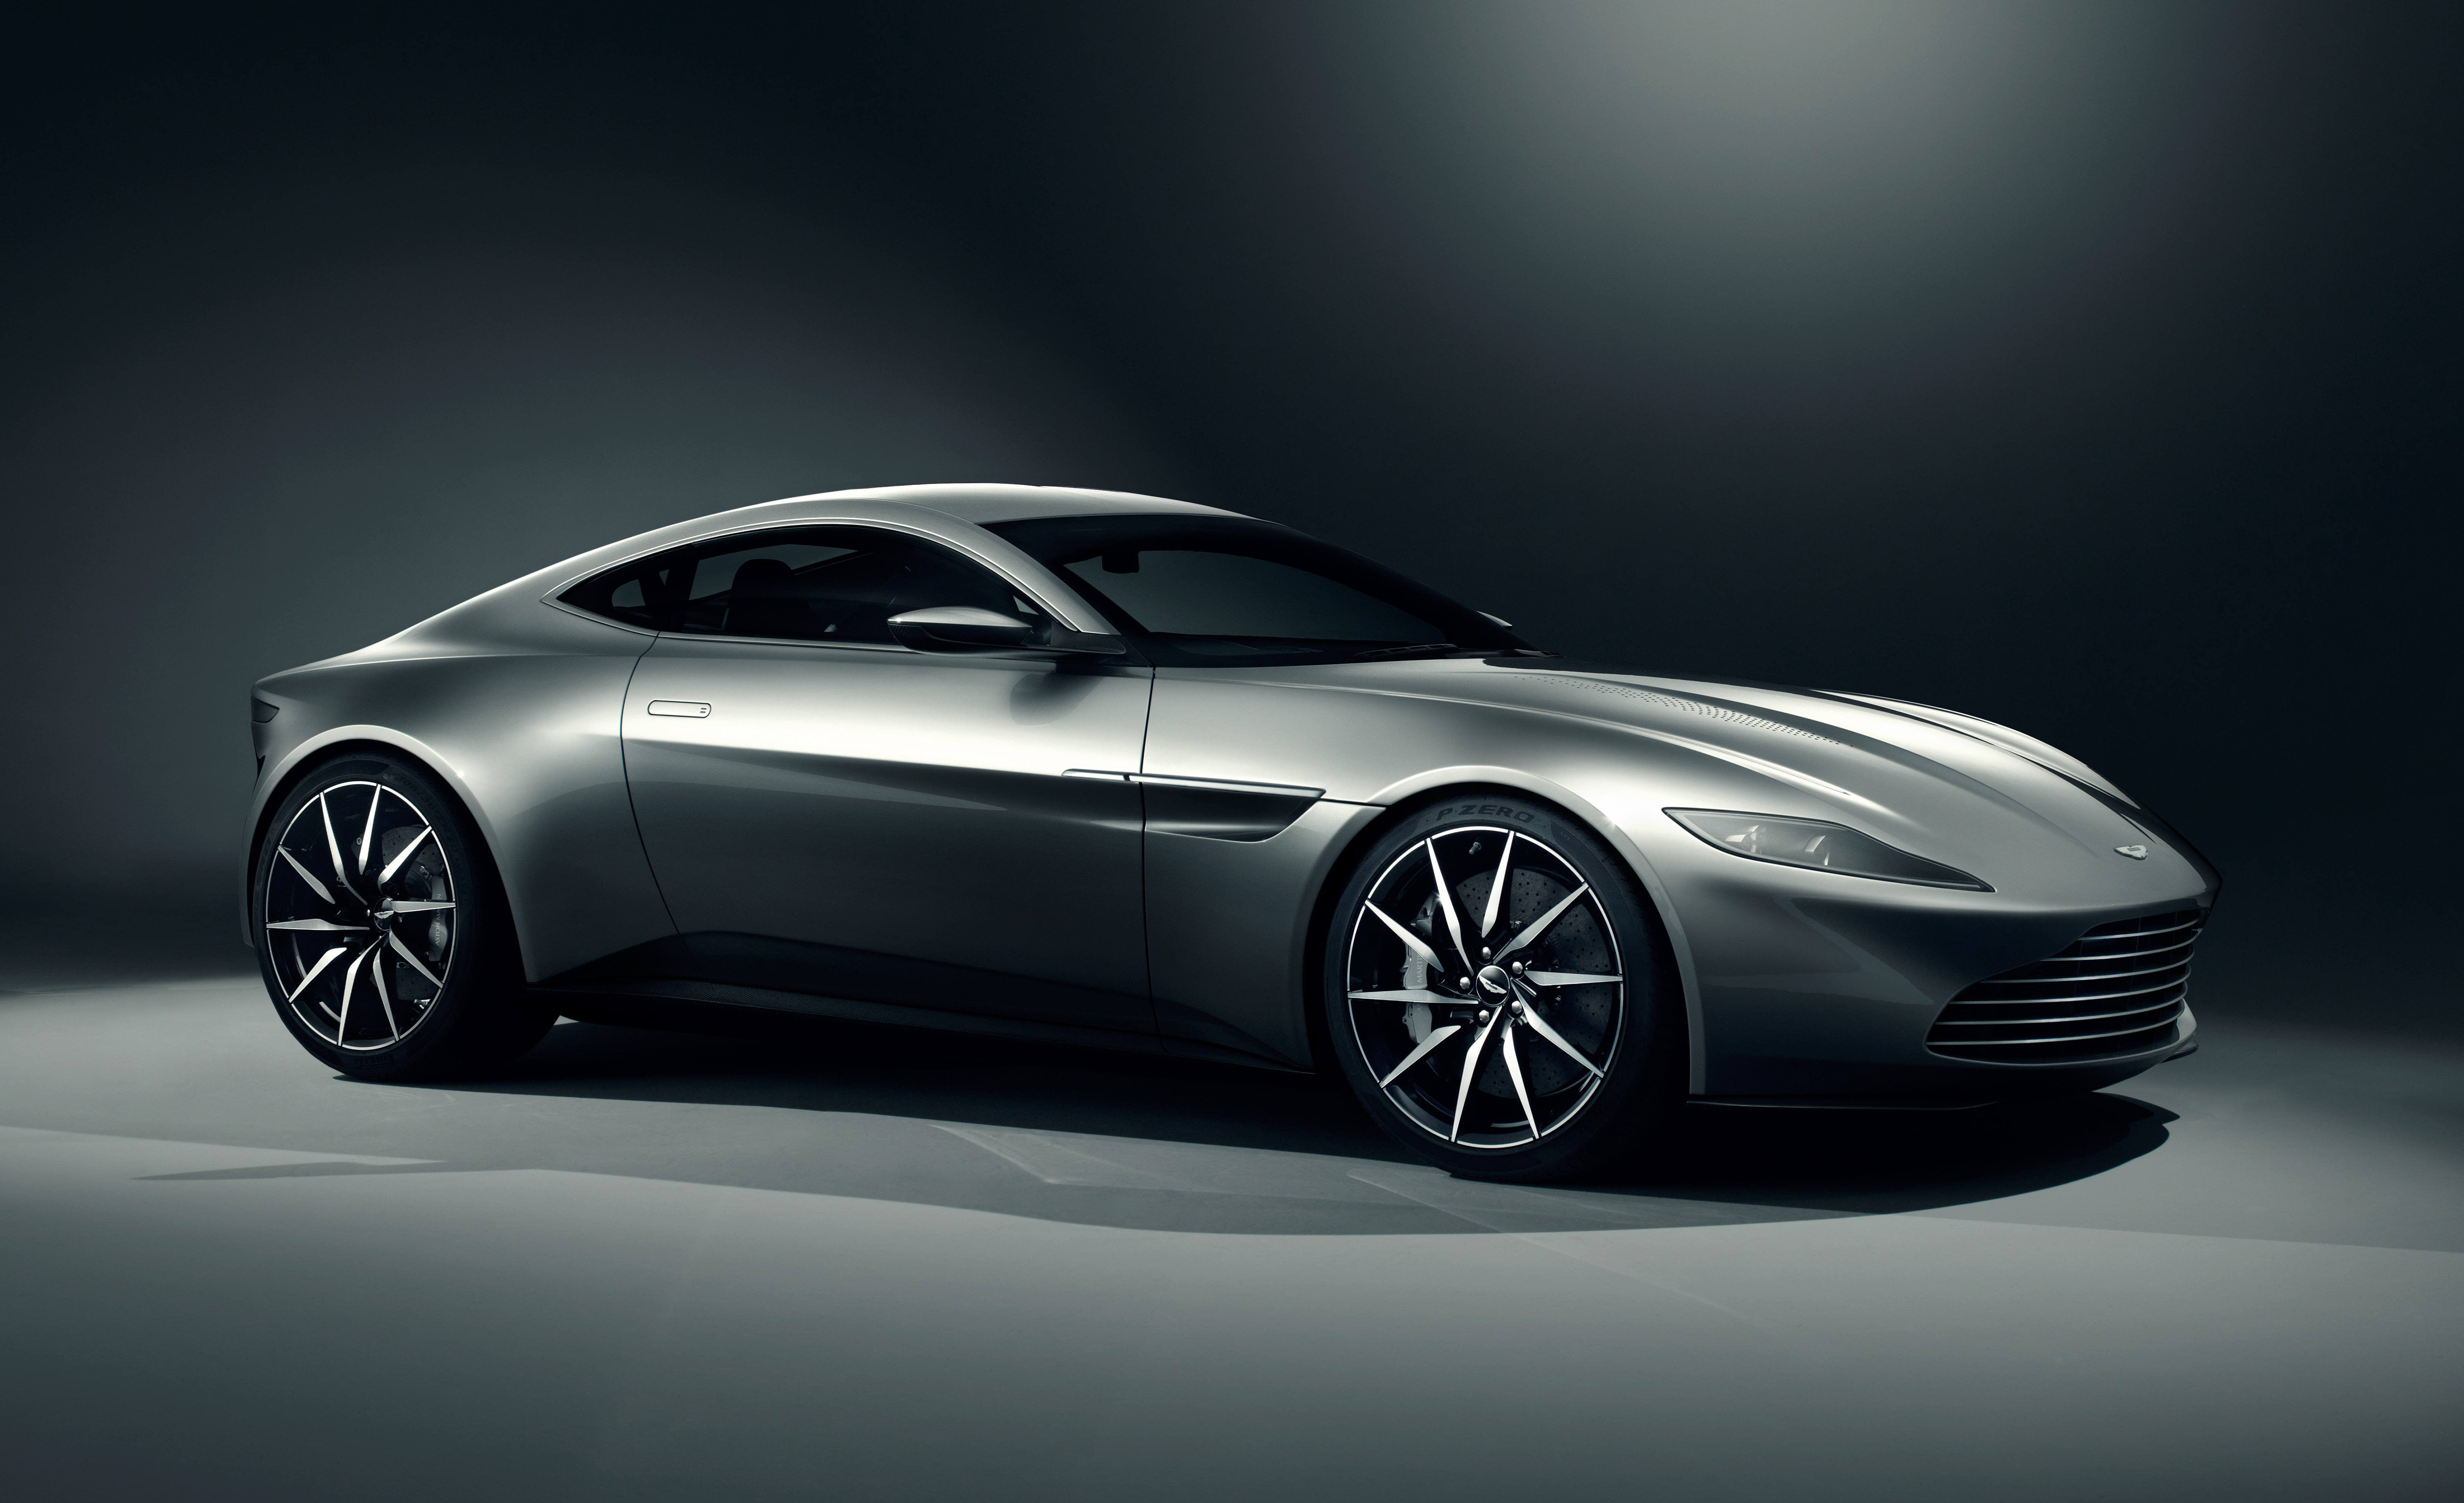 Aston martin db10 bond spectre 01 la boite verte - 007 wallpaper 4k ...